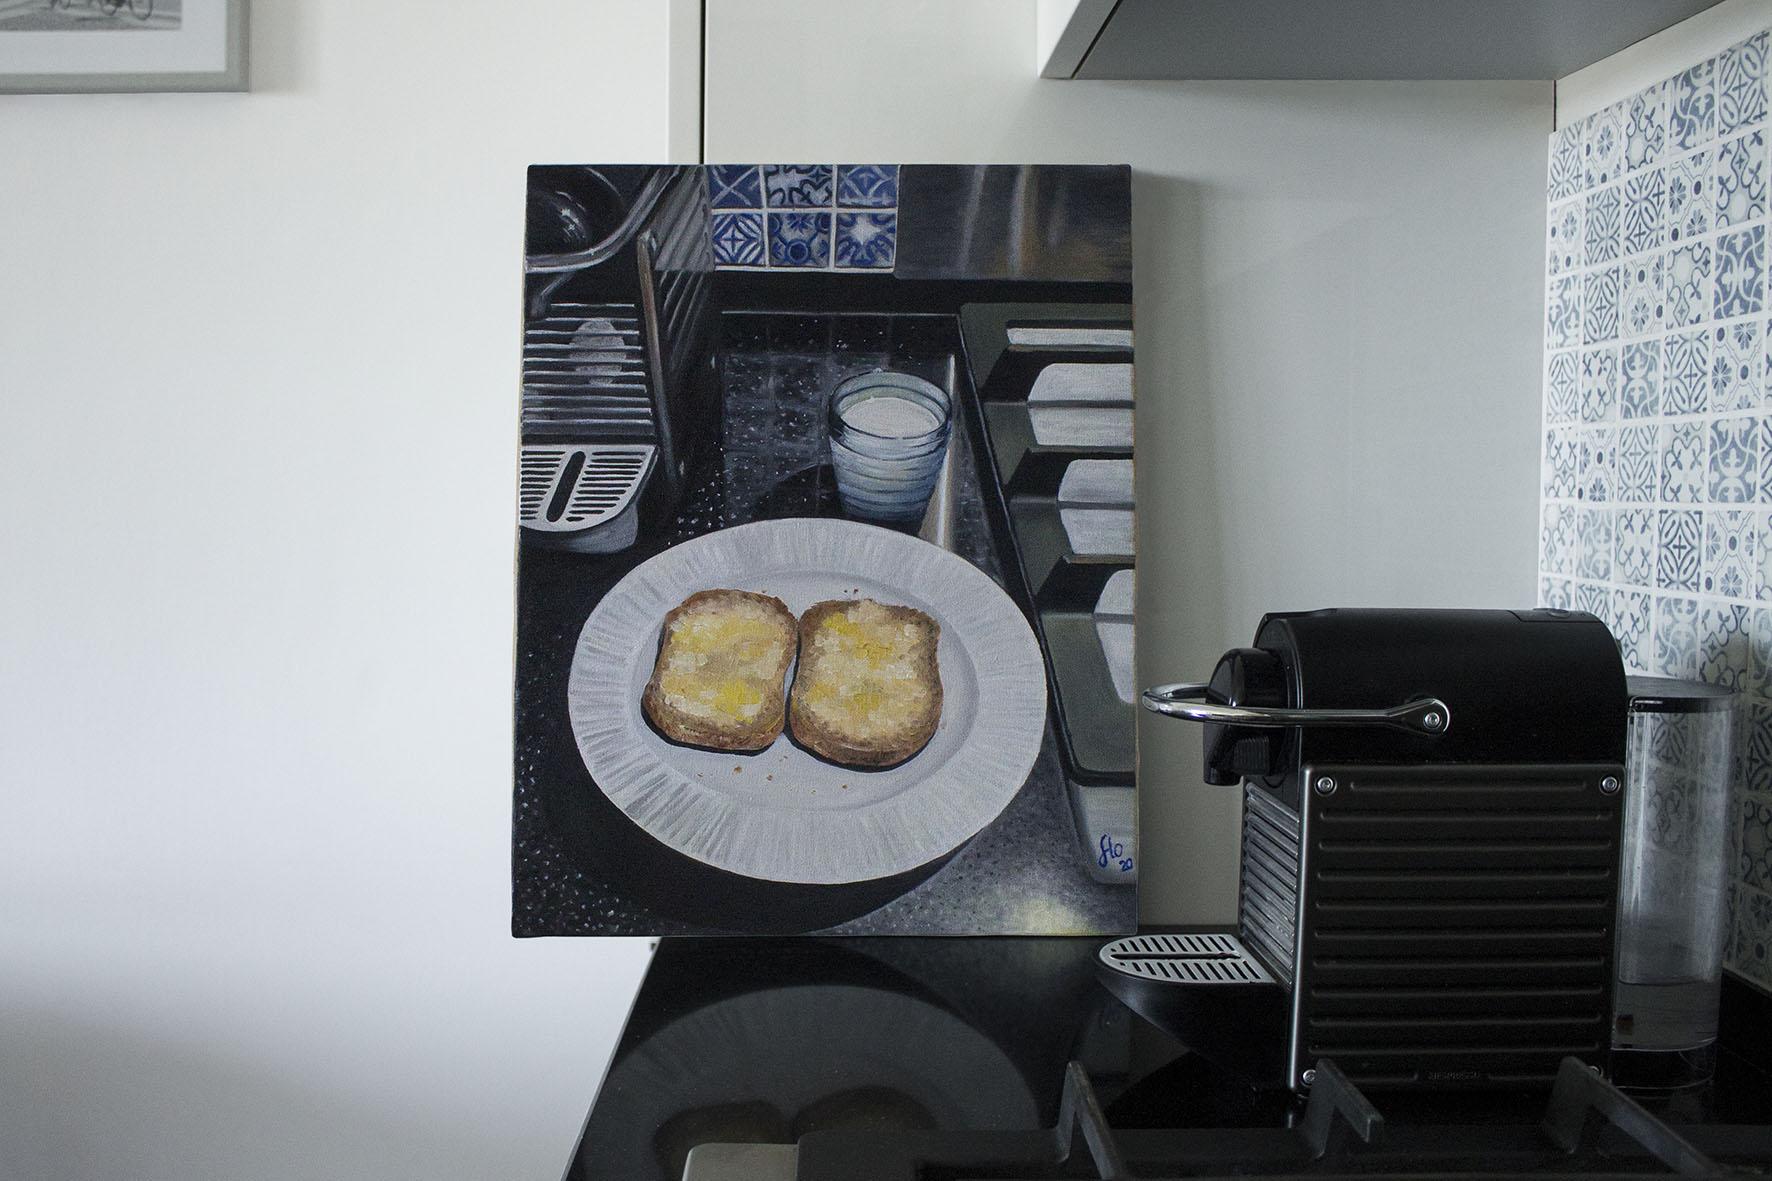 09_Breakfastjpg